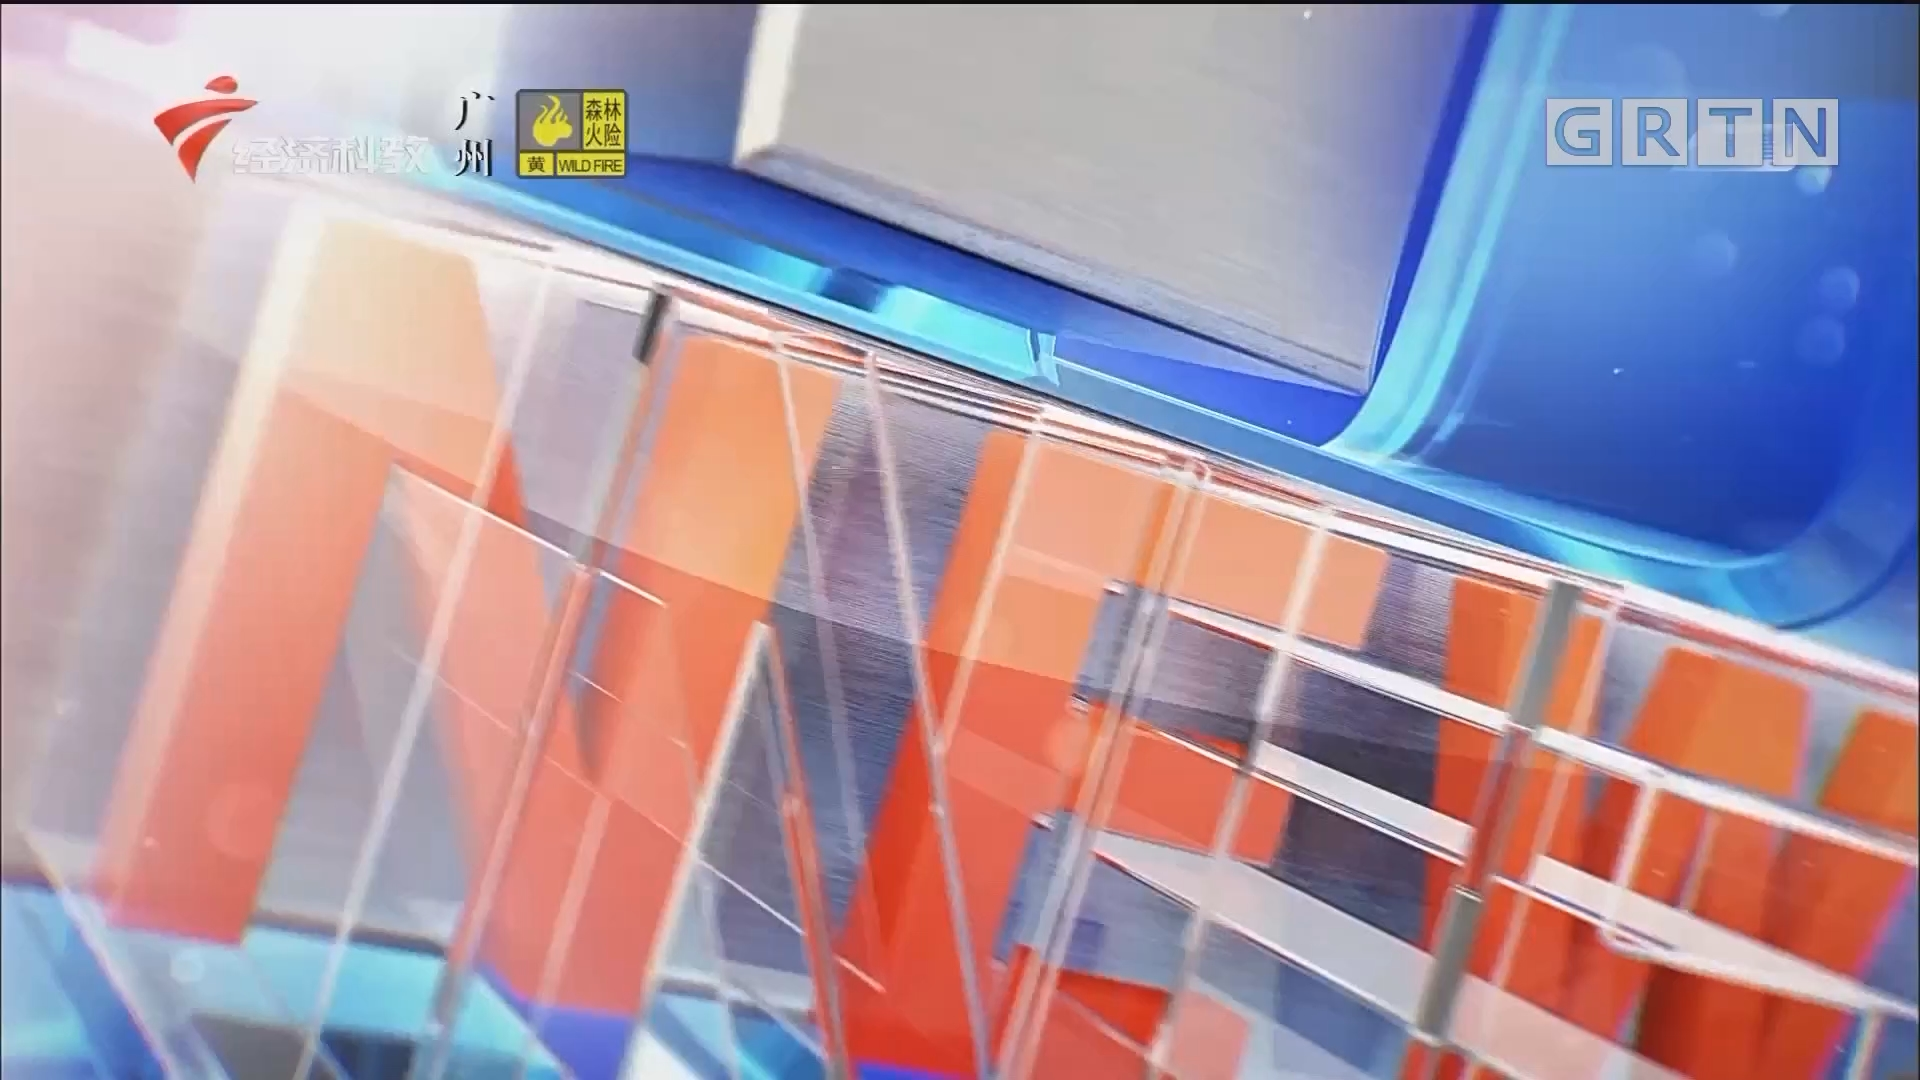 [HD][2020-02-21]南方财经报道:复工复产进行时 粤港澳大湾区以科技助力打赢疫情防控狙击战